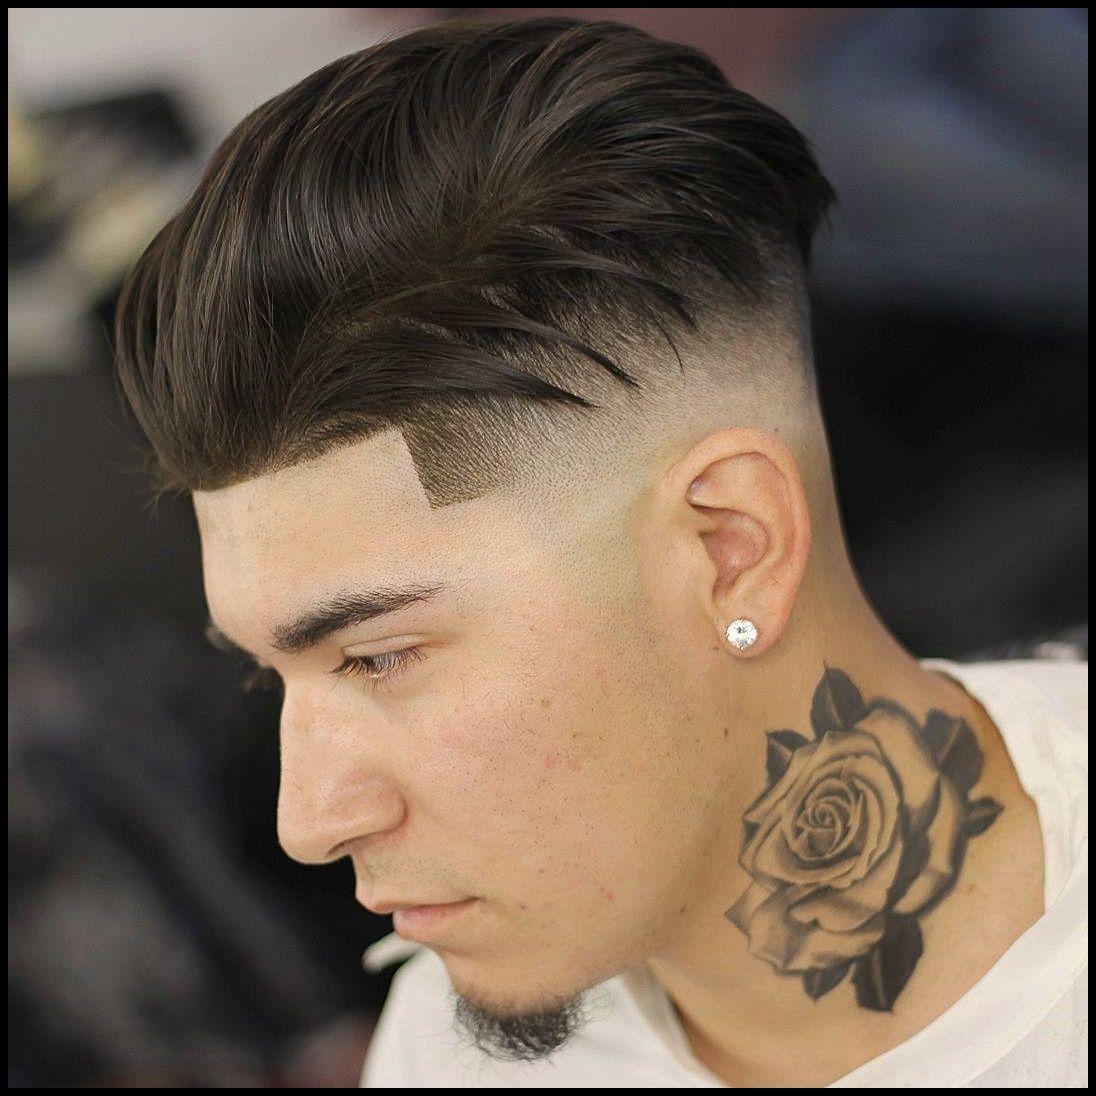 2018 haircut for men die besten männer haarschnitte besten haarschnitte manner